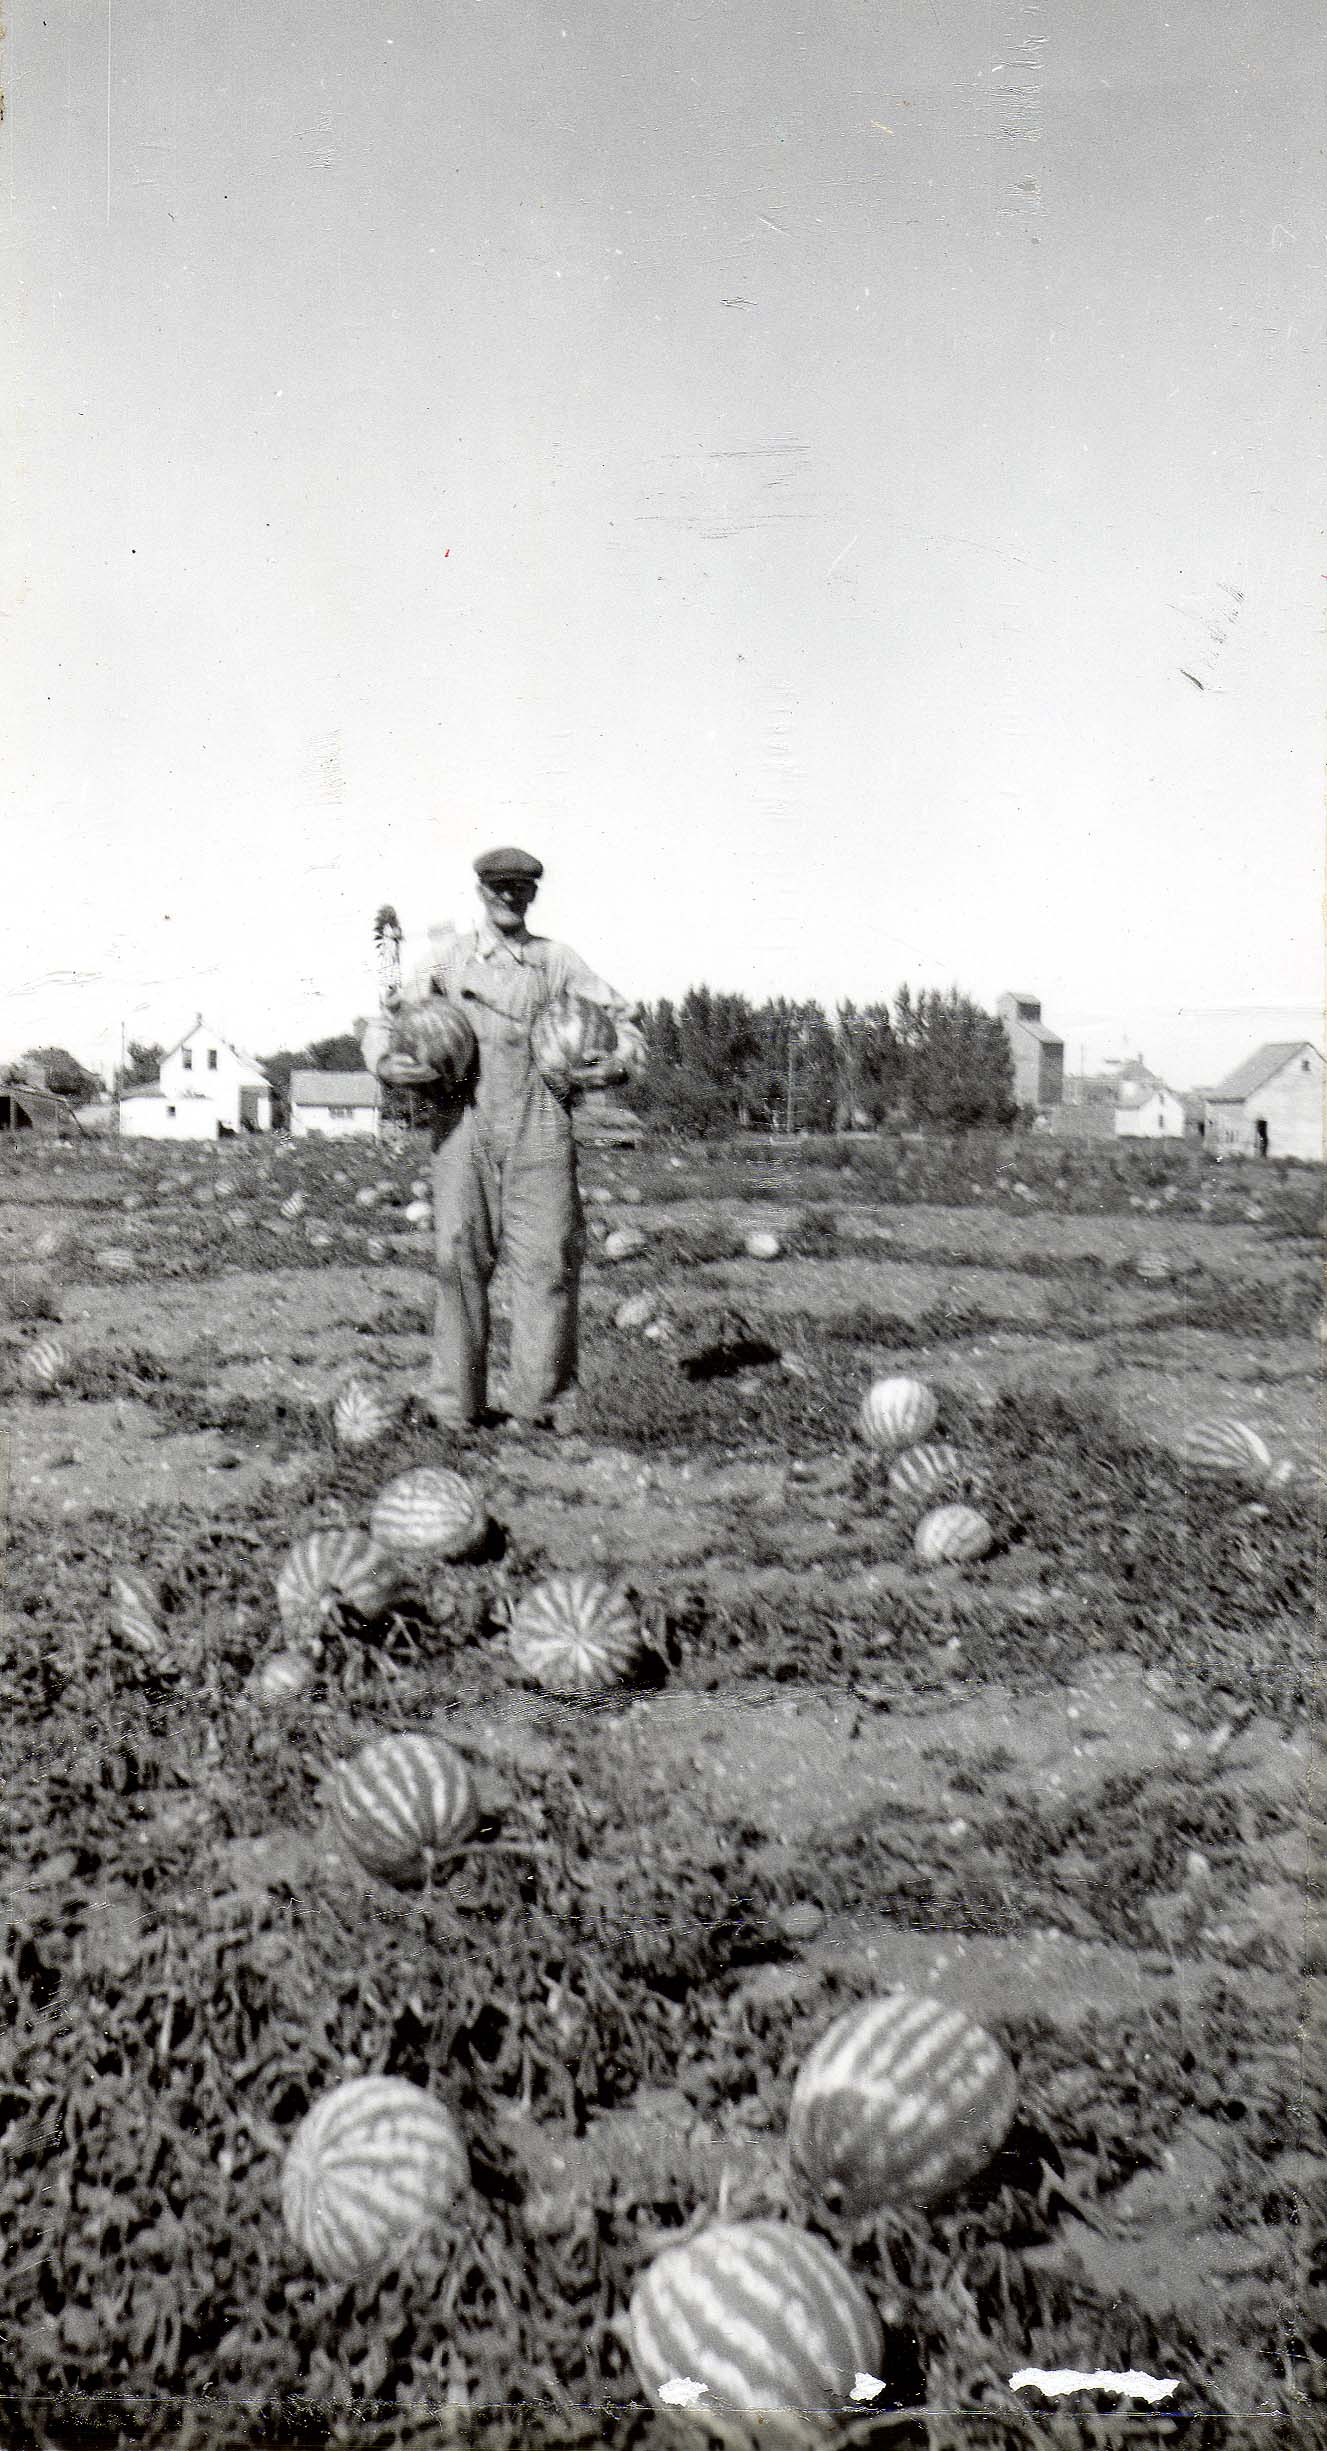 North dakota logan county fredonia - 11 Regner Family Eats Melons Every Year